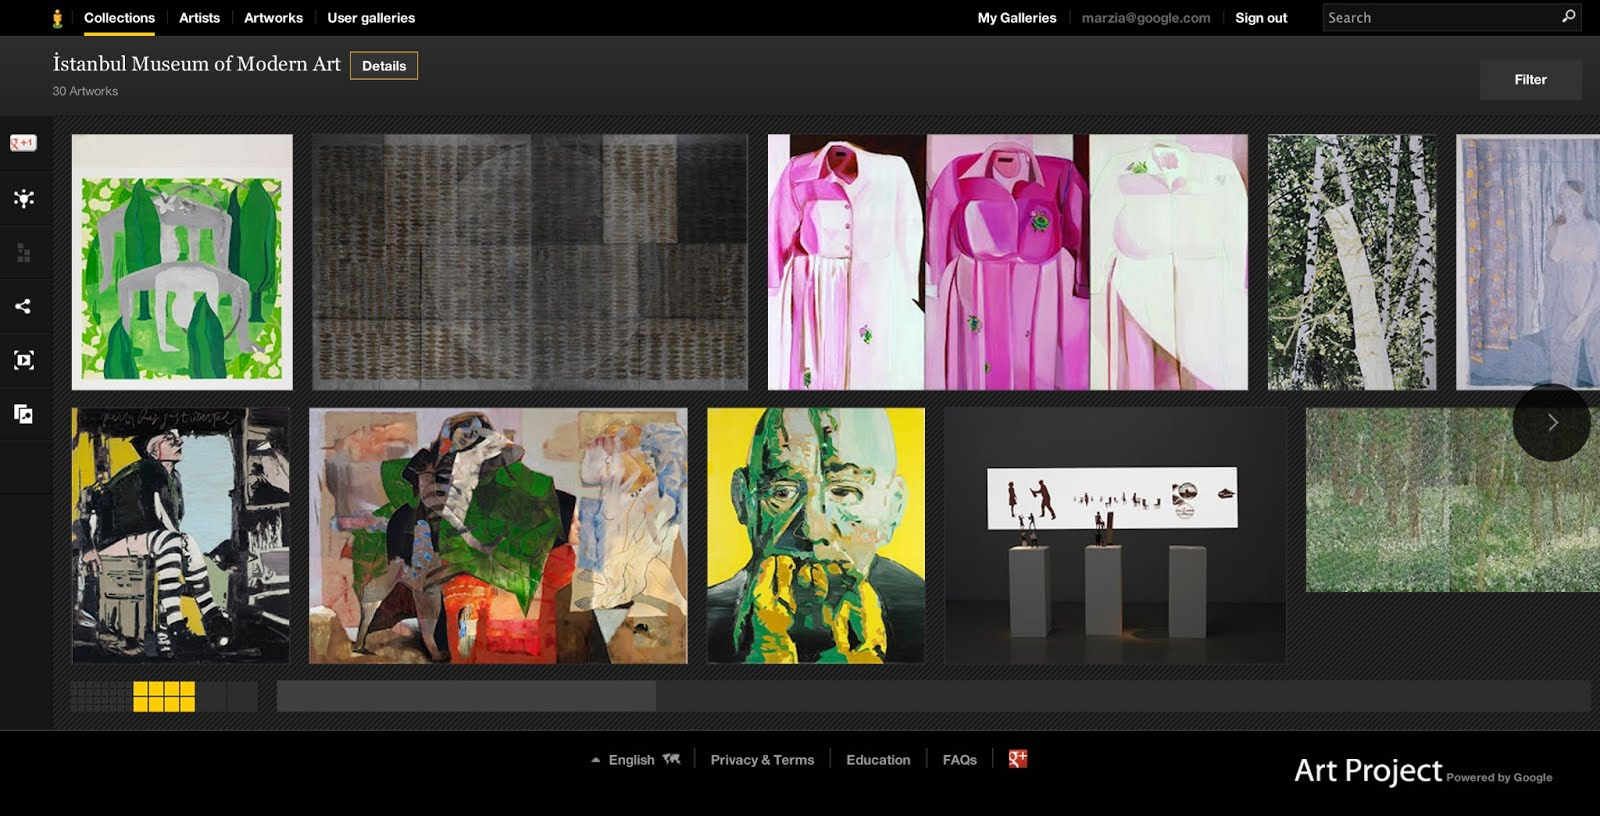 More Project online explore